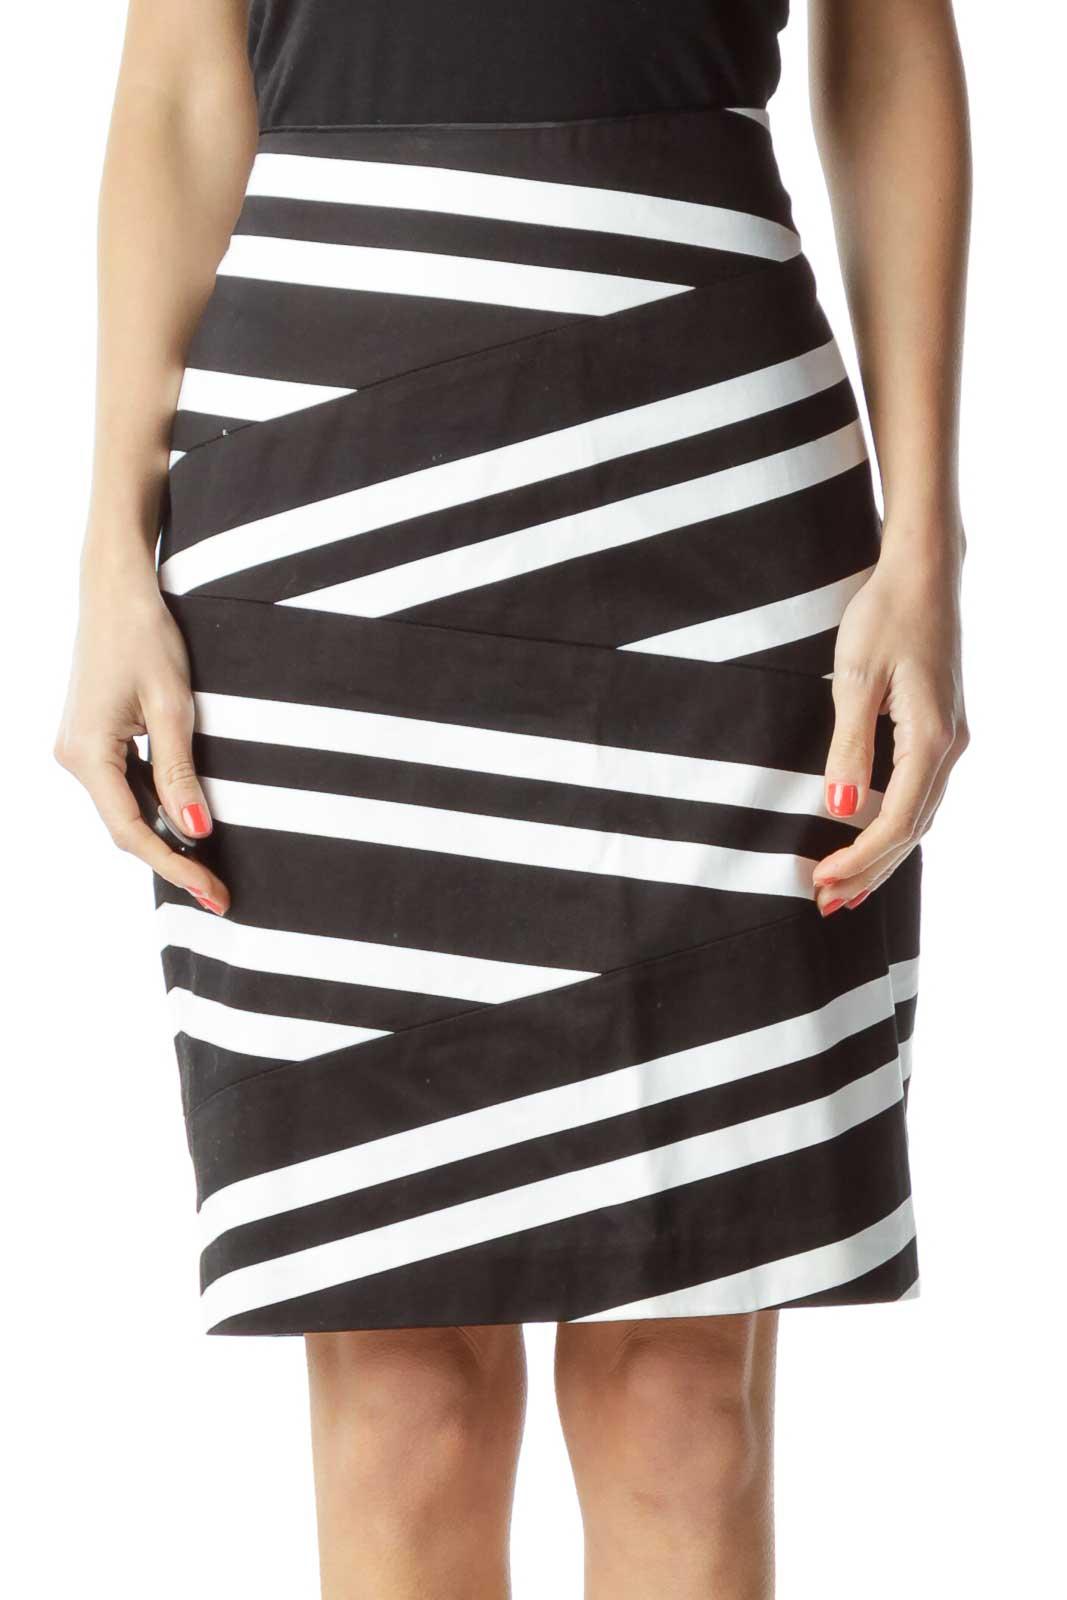 Black White Striped Pencil Skirt